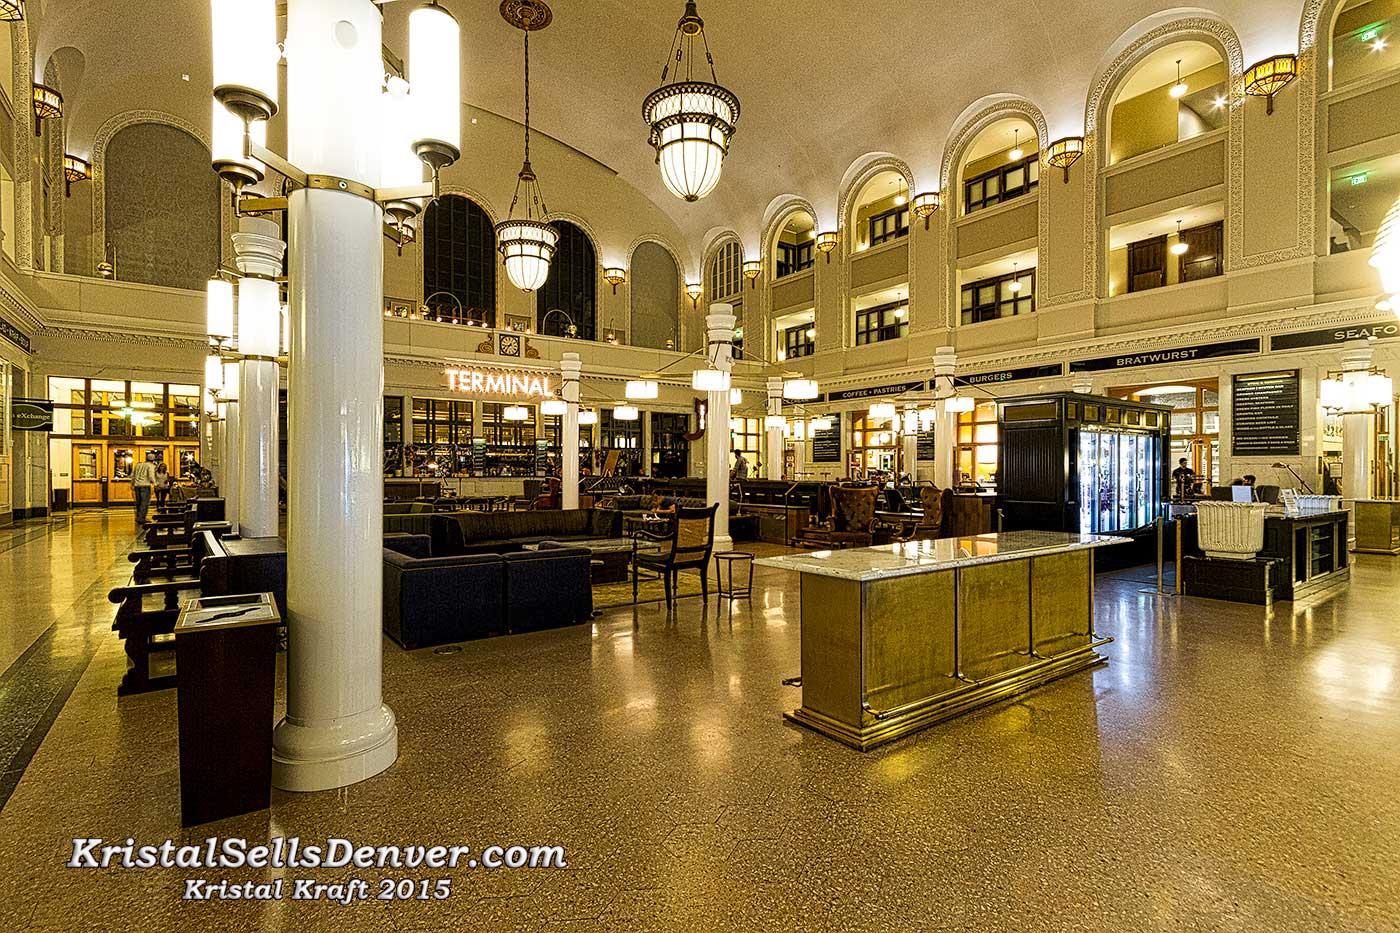 Denver's Union Station Terminal